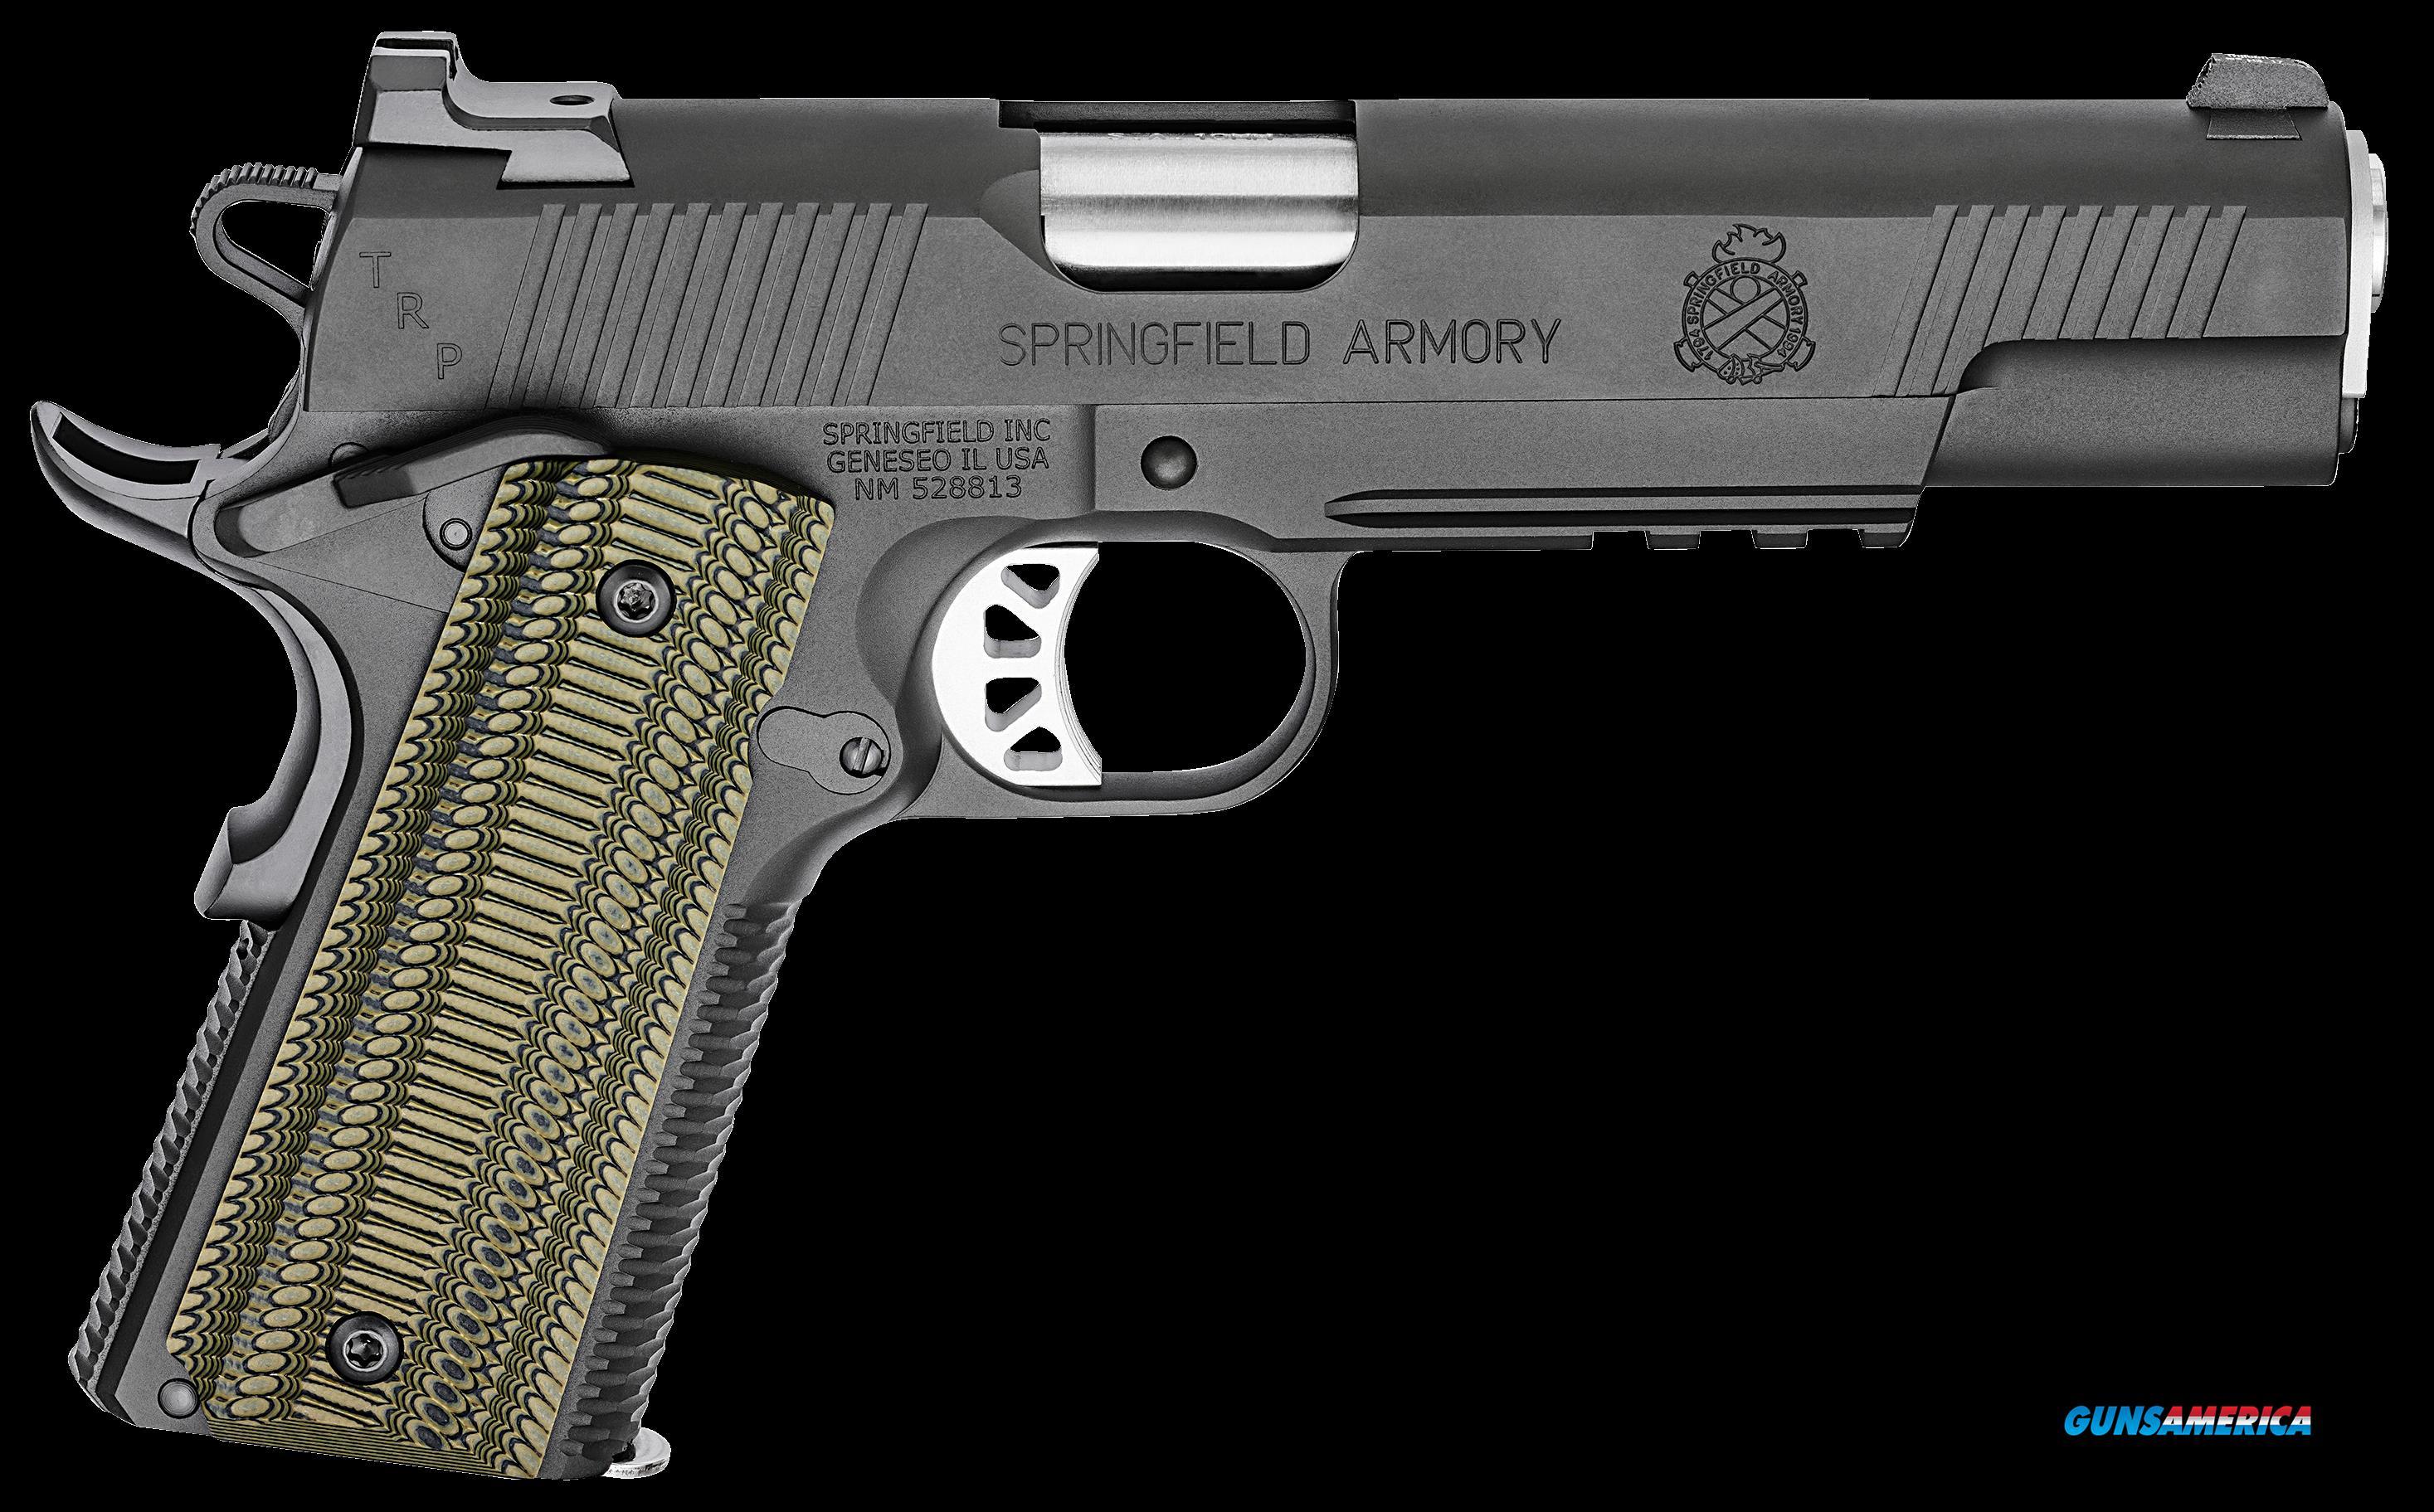 Springfield Armory 1911, Spg Pc9510l18      10m Trp Operator 5in    Ss  Guns > Pistols > 1911 Pistol Copies (non-Colt)